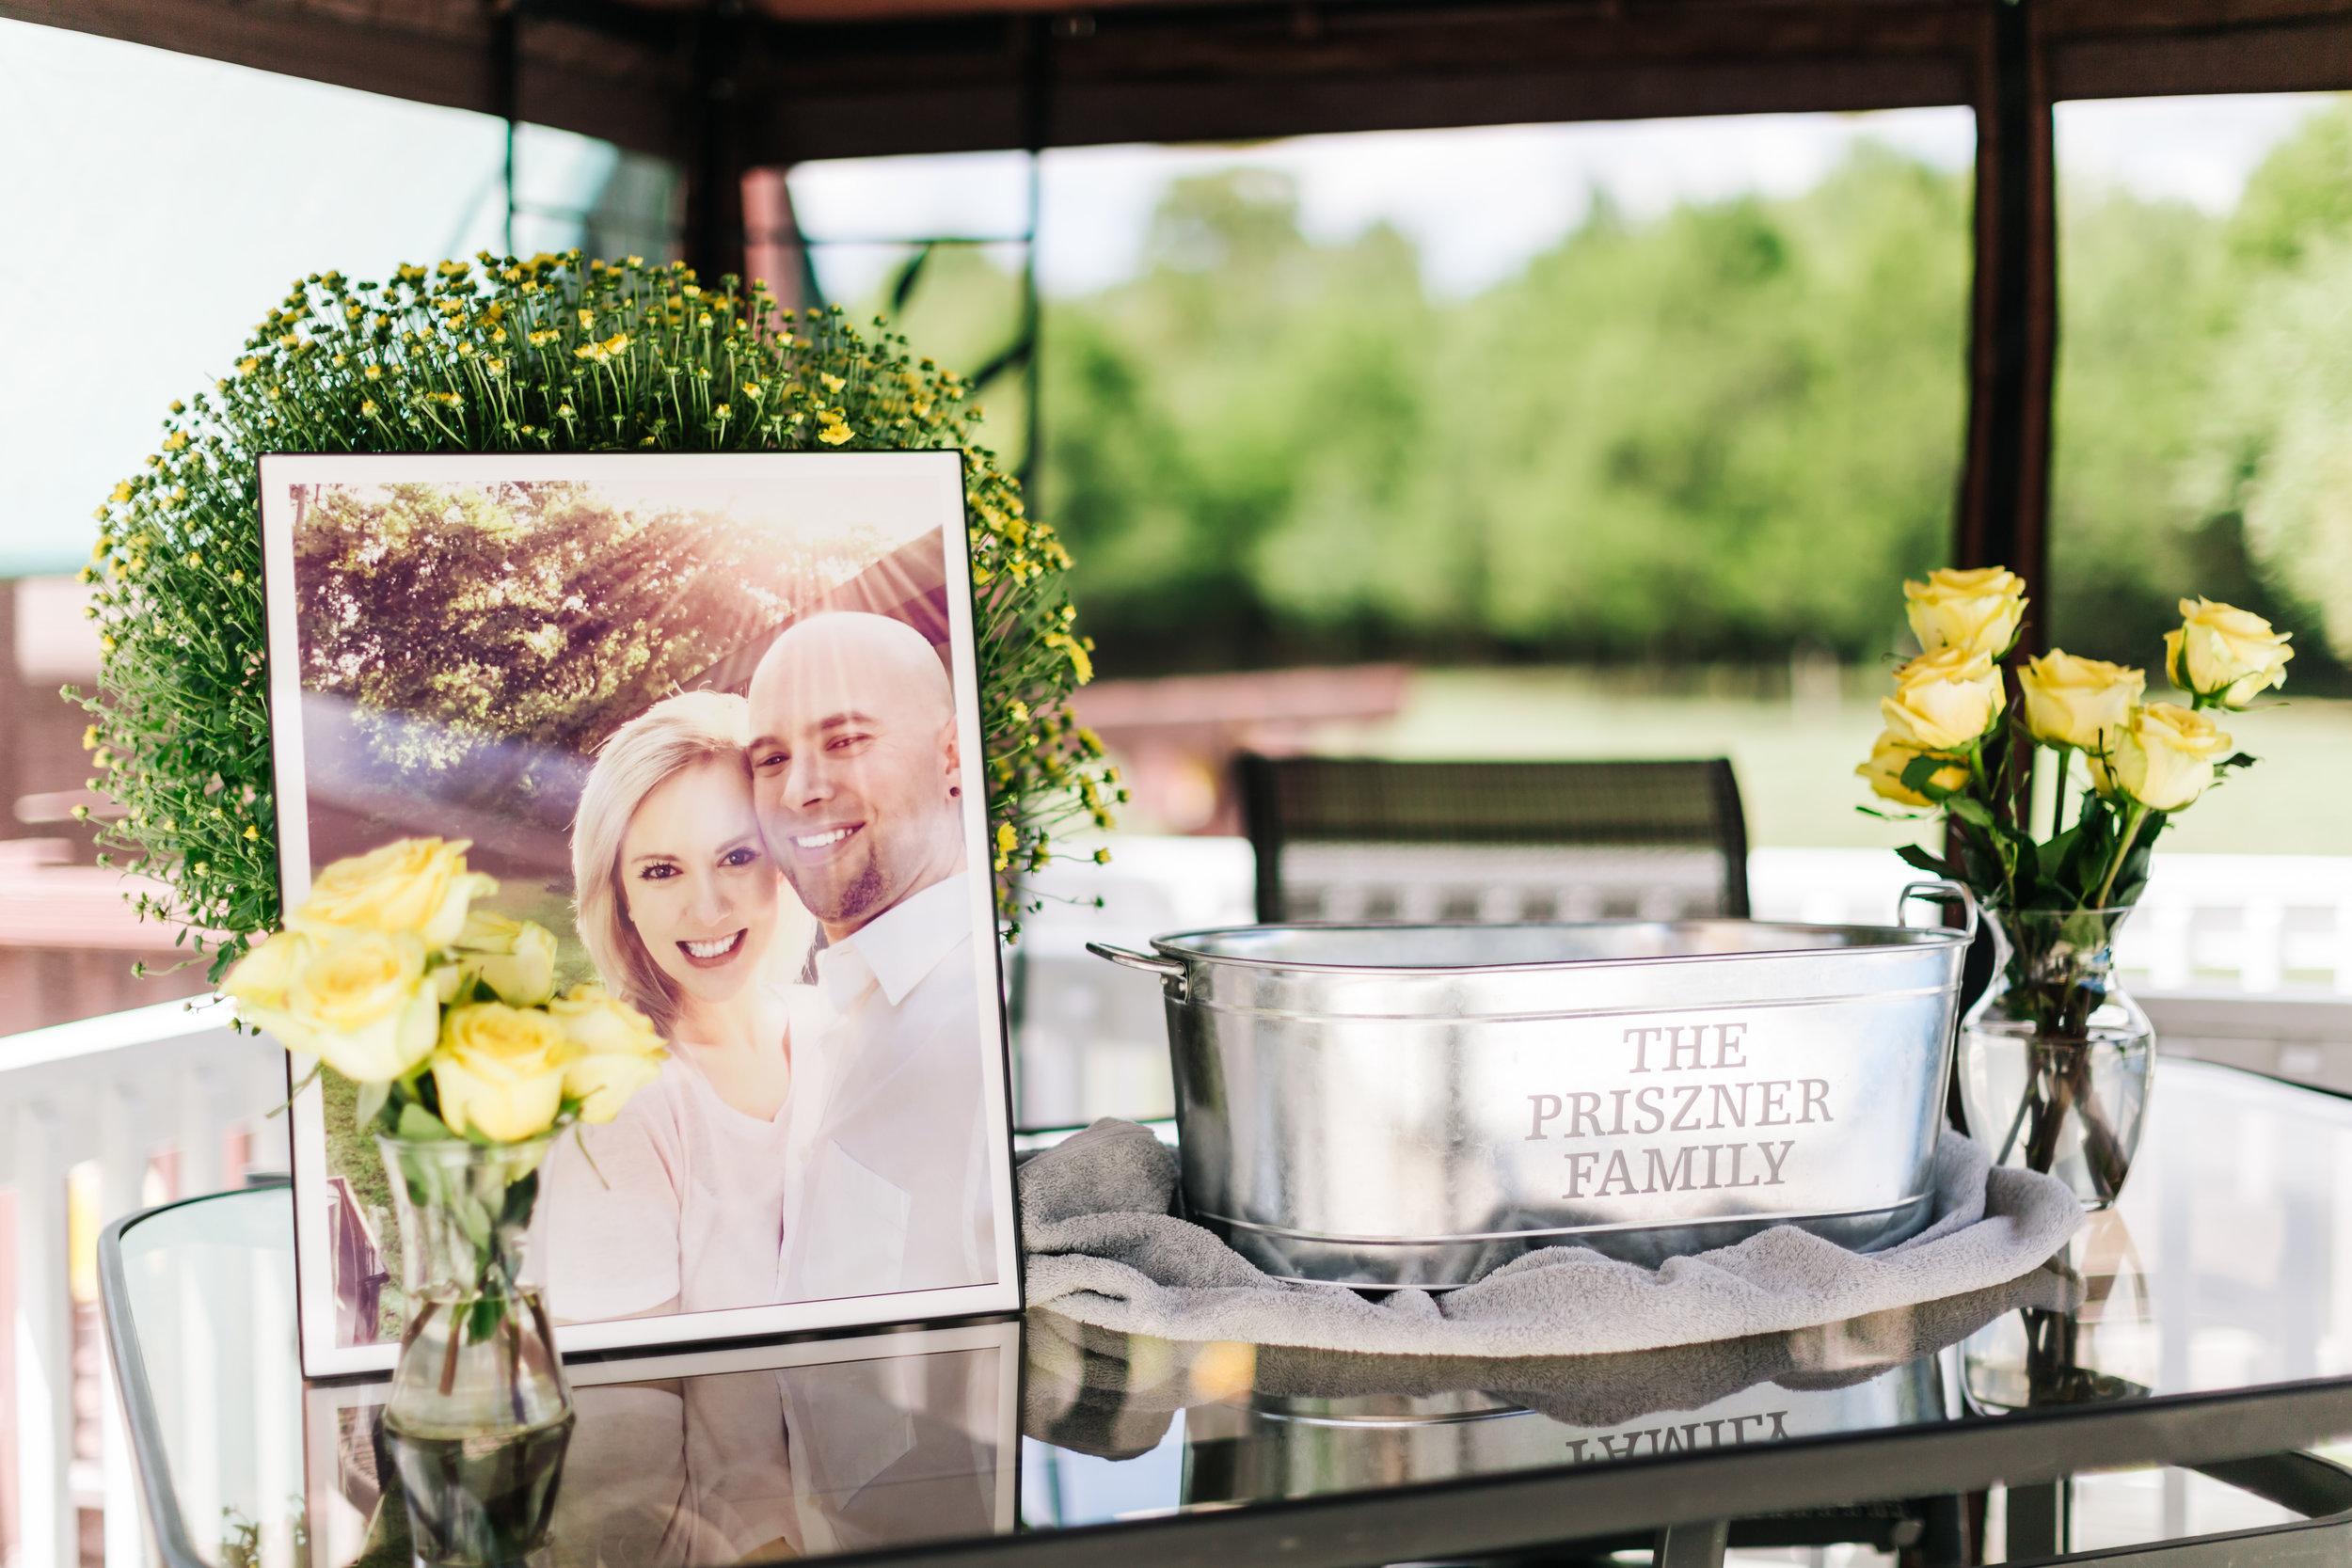 2018.09.02 Ray and Sarah Prizner Nashville TN Wedding FINALS-211.jpg